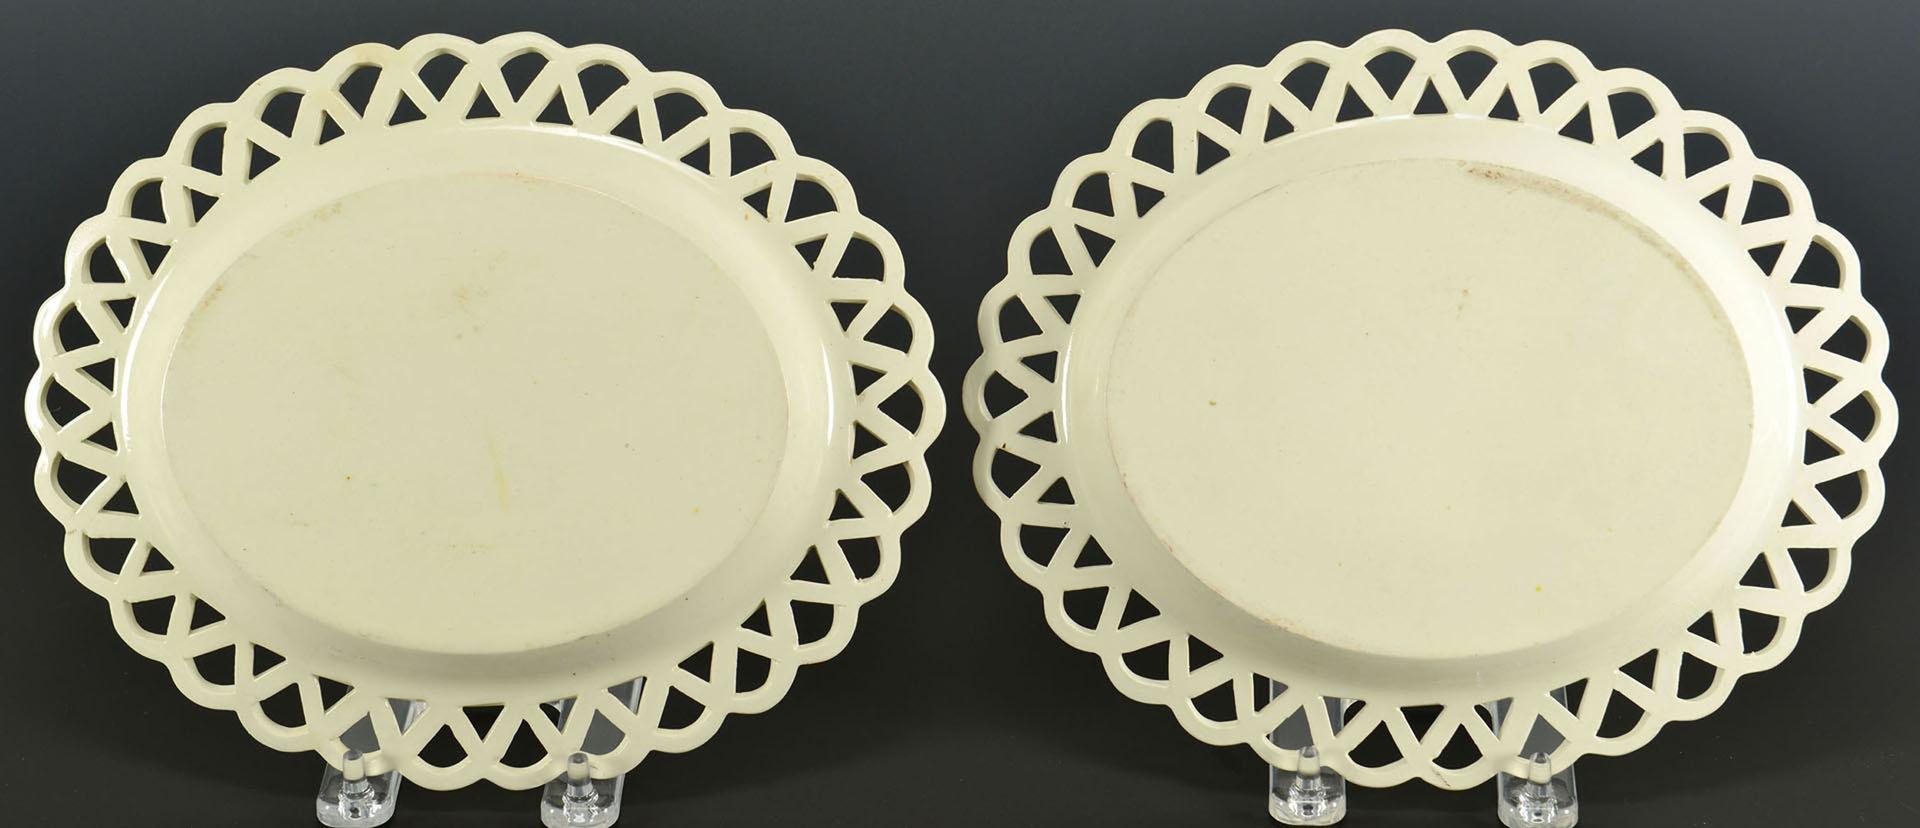 Lot 97: Pr polychrome creamware baskets, underplates